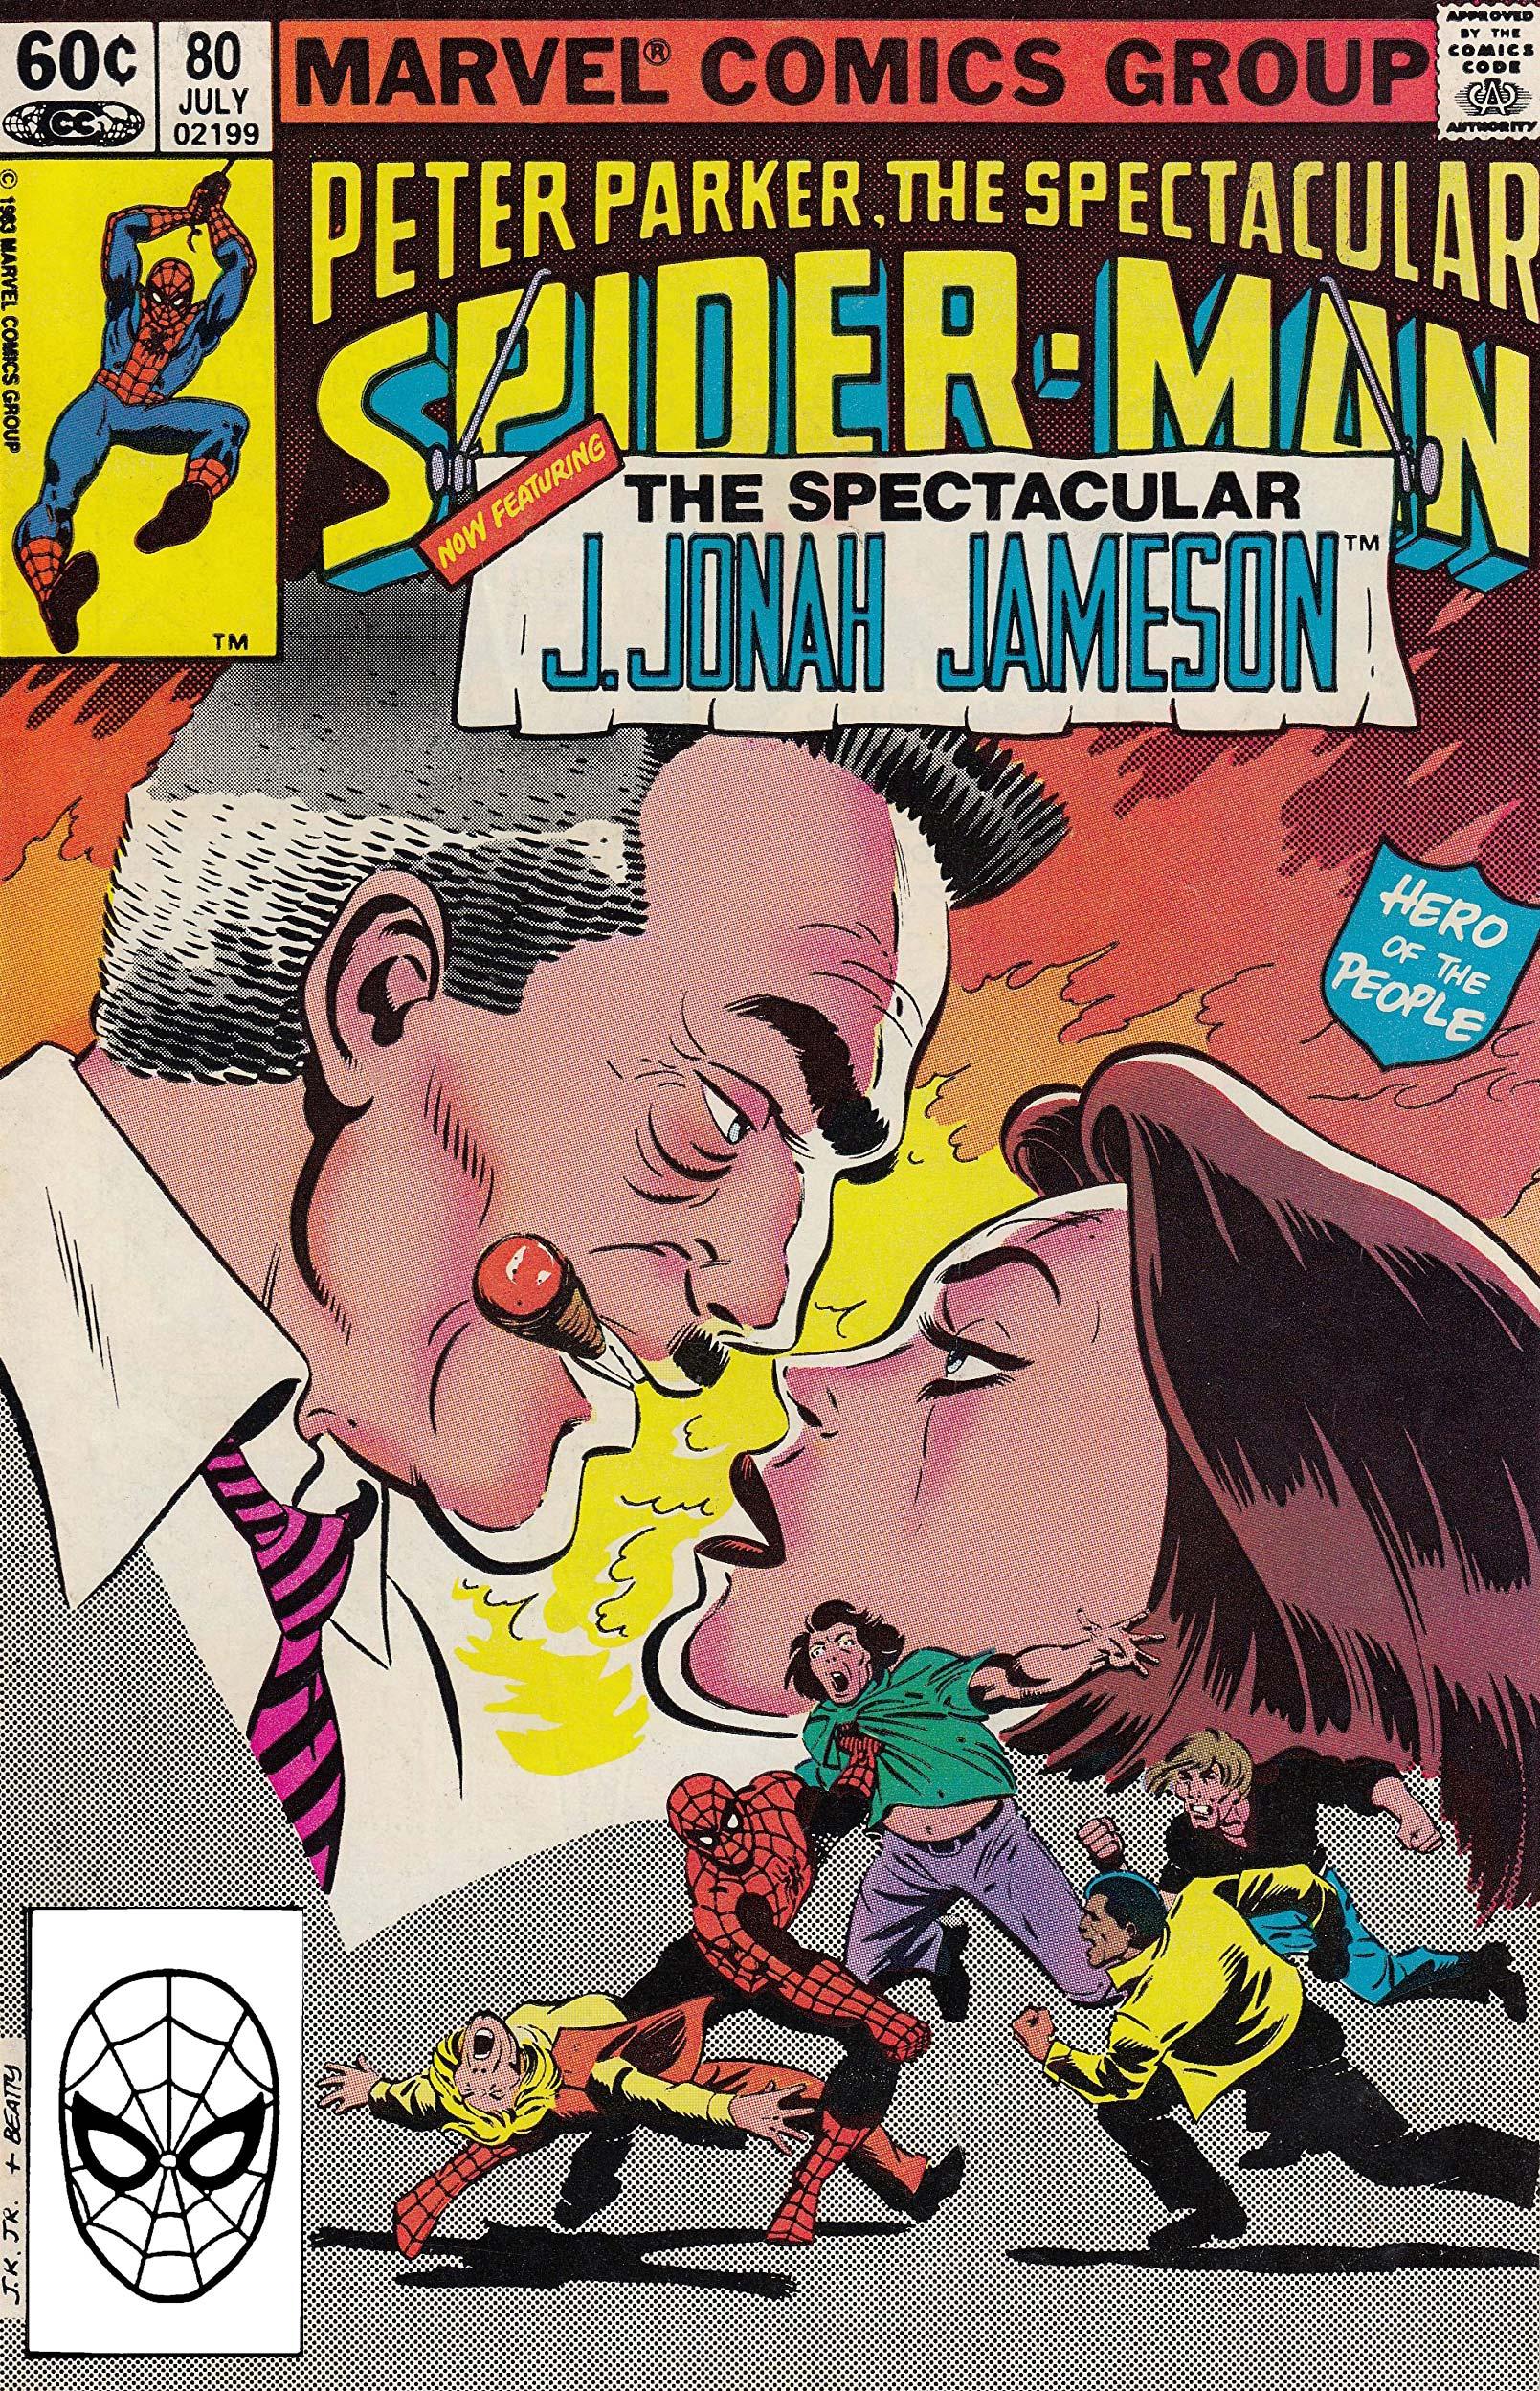 Peter Parker, the Spectacular Spider-Man (1976) #80